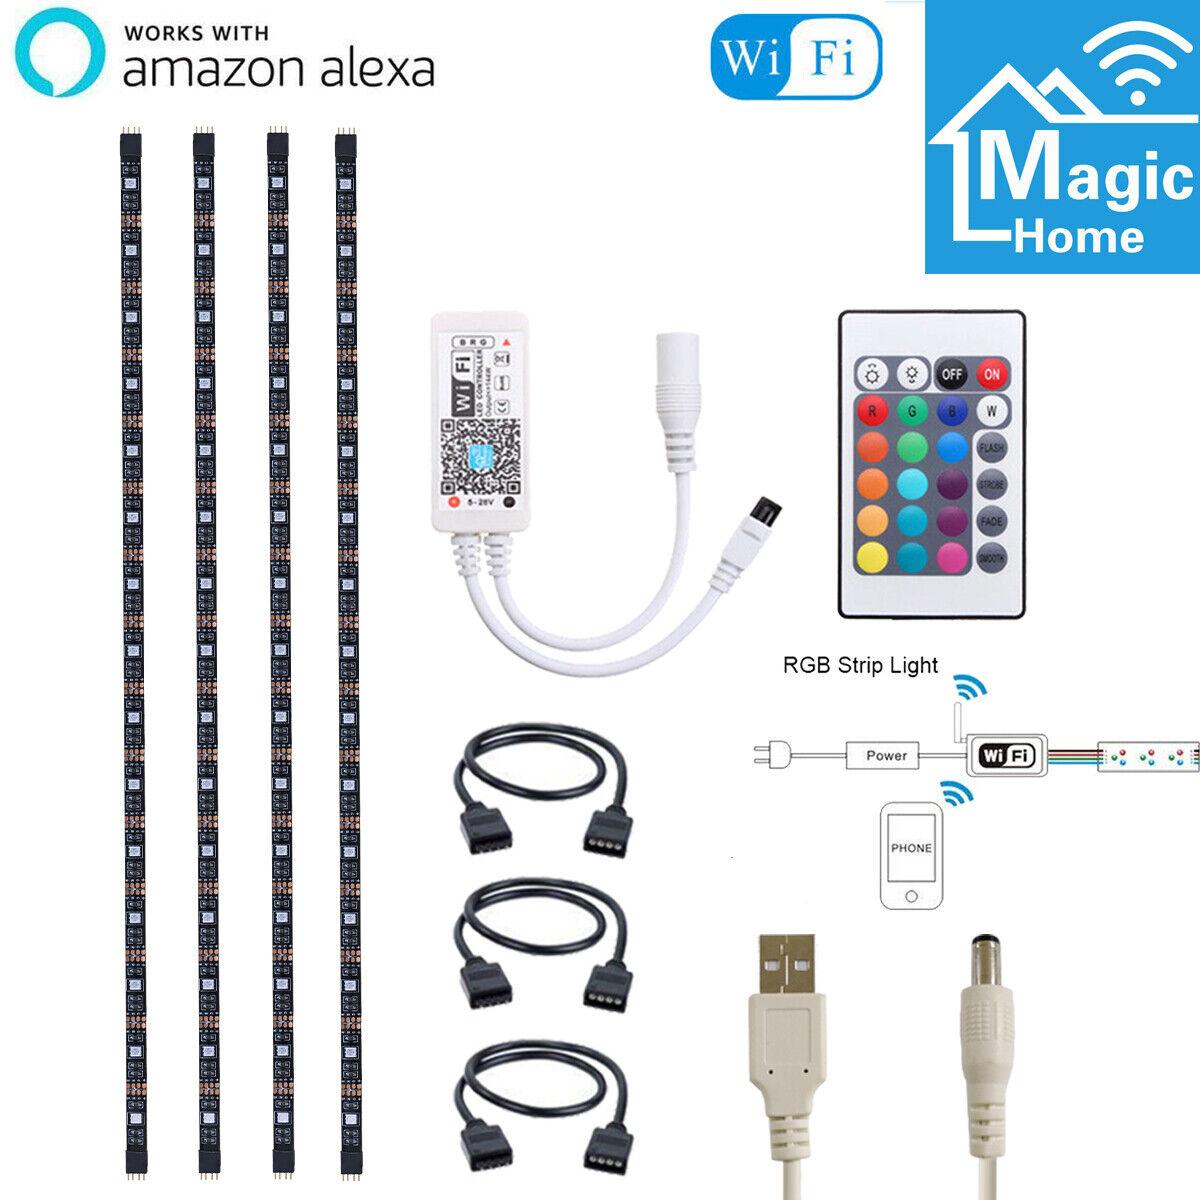 4pcs USB Powered RGB LED Strips Smart WiFi Mood Light for Alexa Google Home 5V